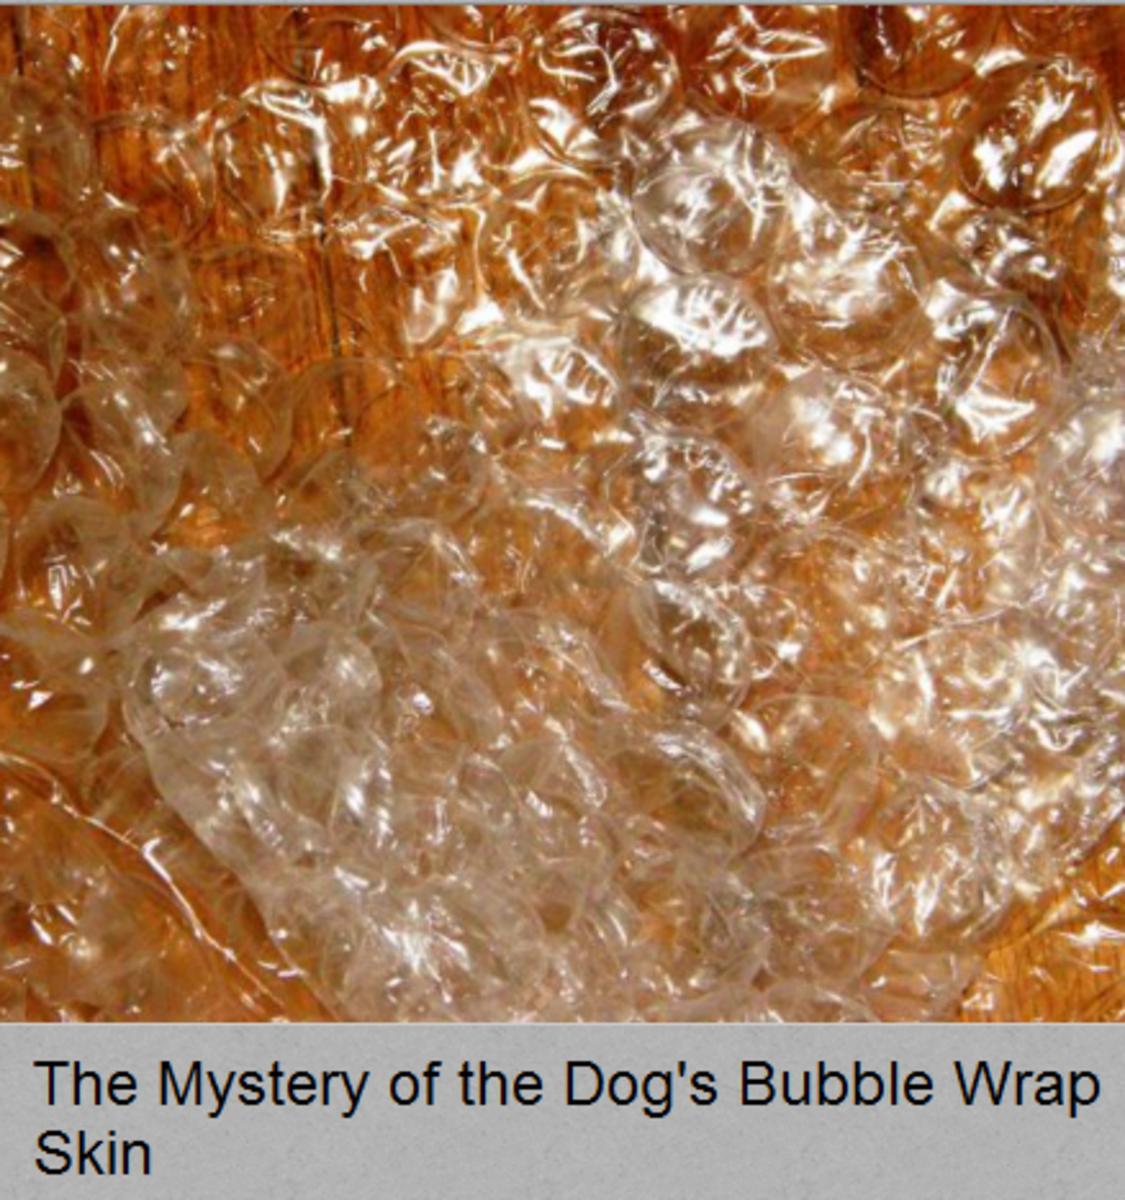 Dog skin feels like bubble wrap?